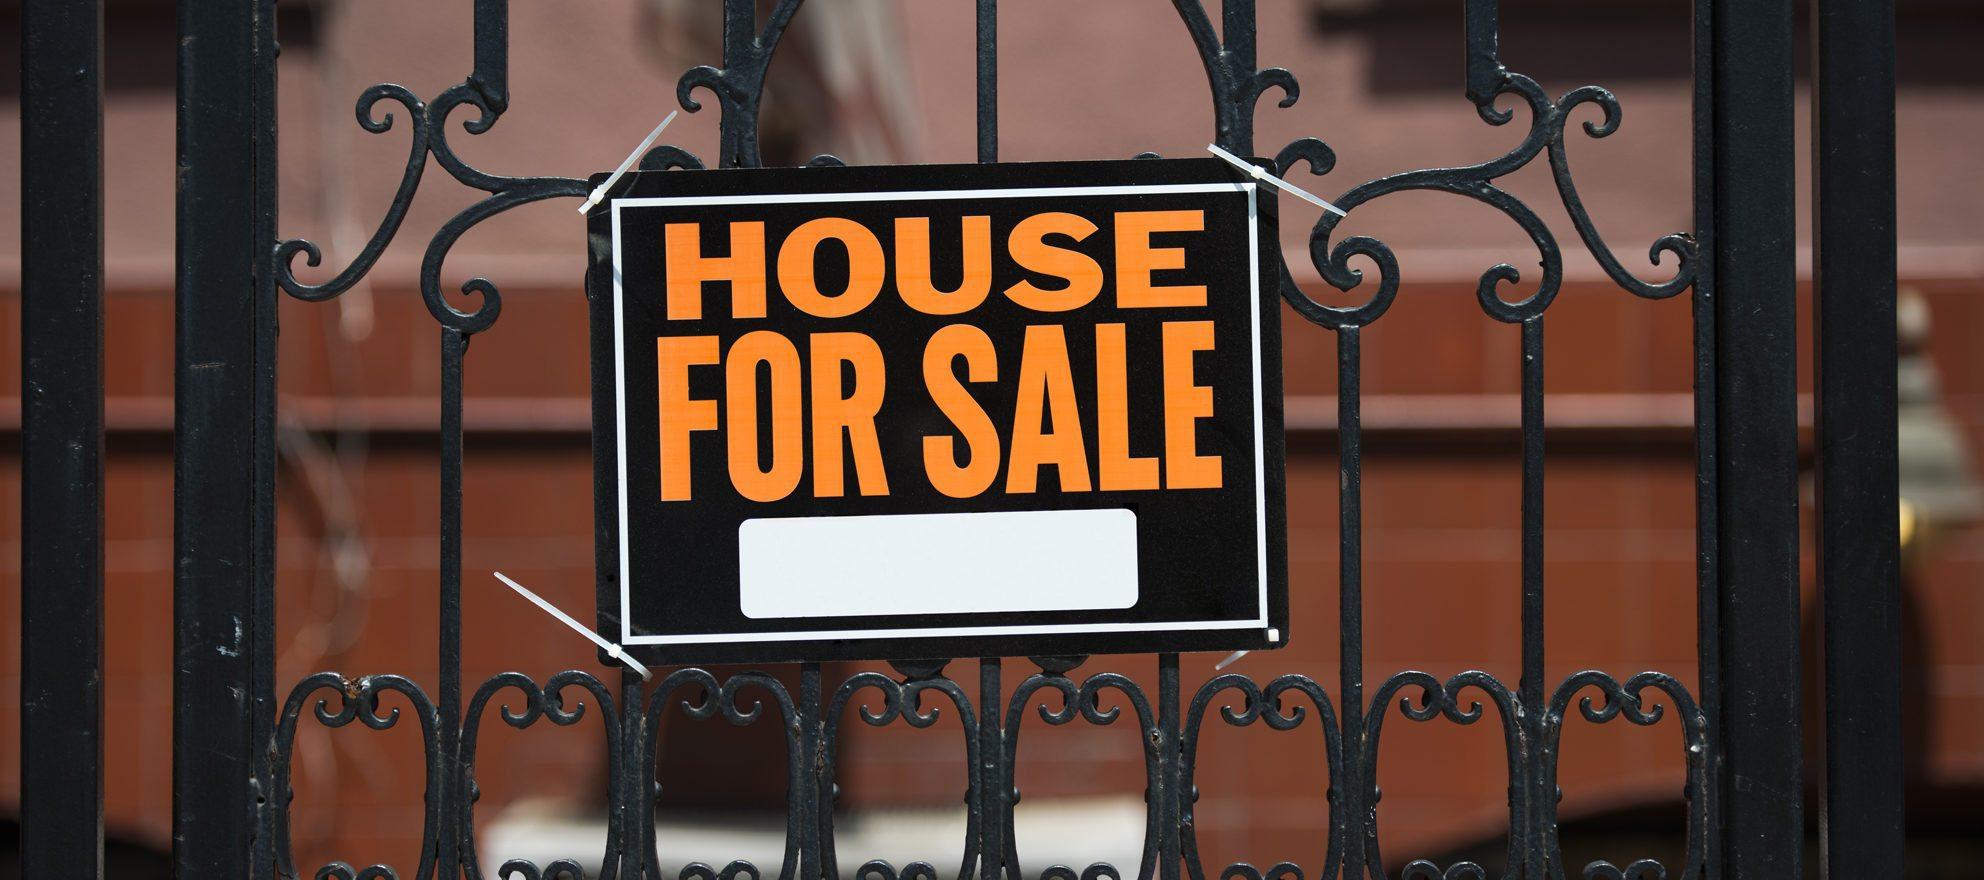 Anemic Housing Market